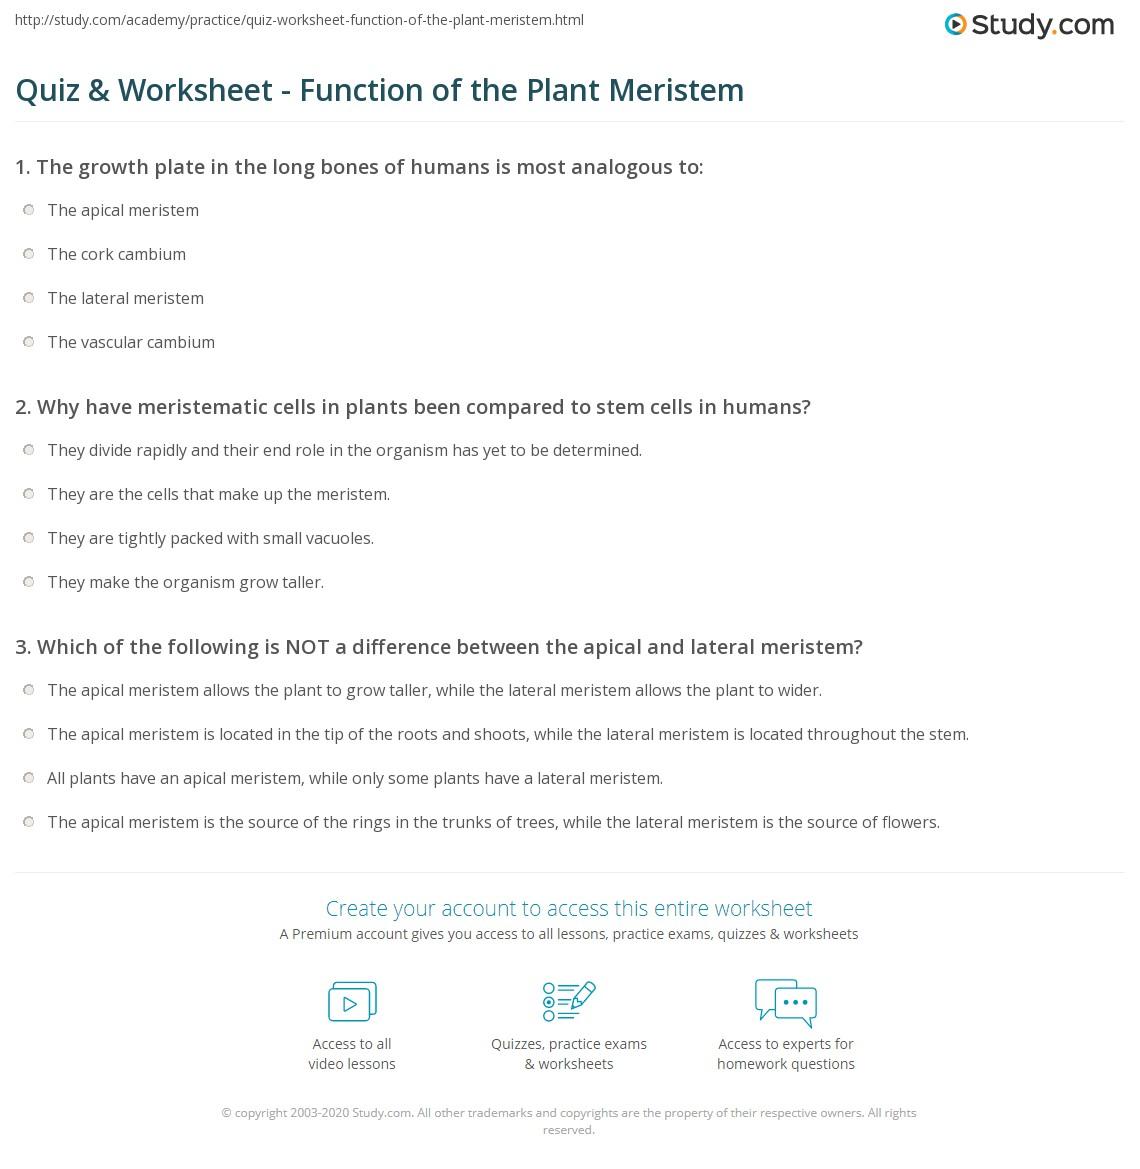 Quiz Worksheet Function of the Plant Meristem – Worksheet Function